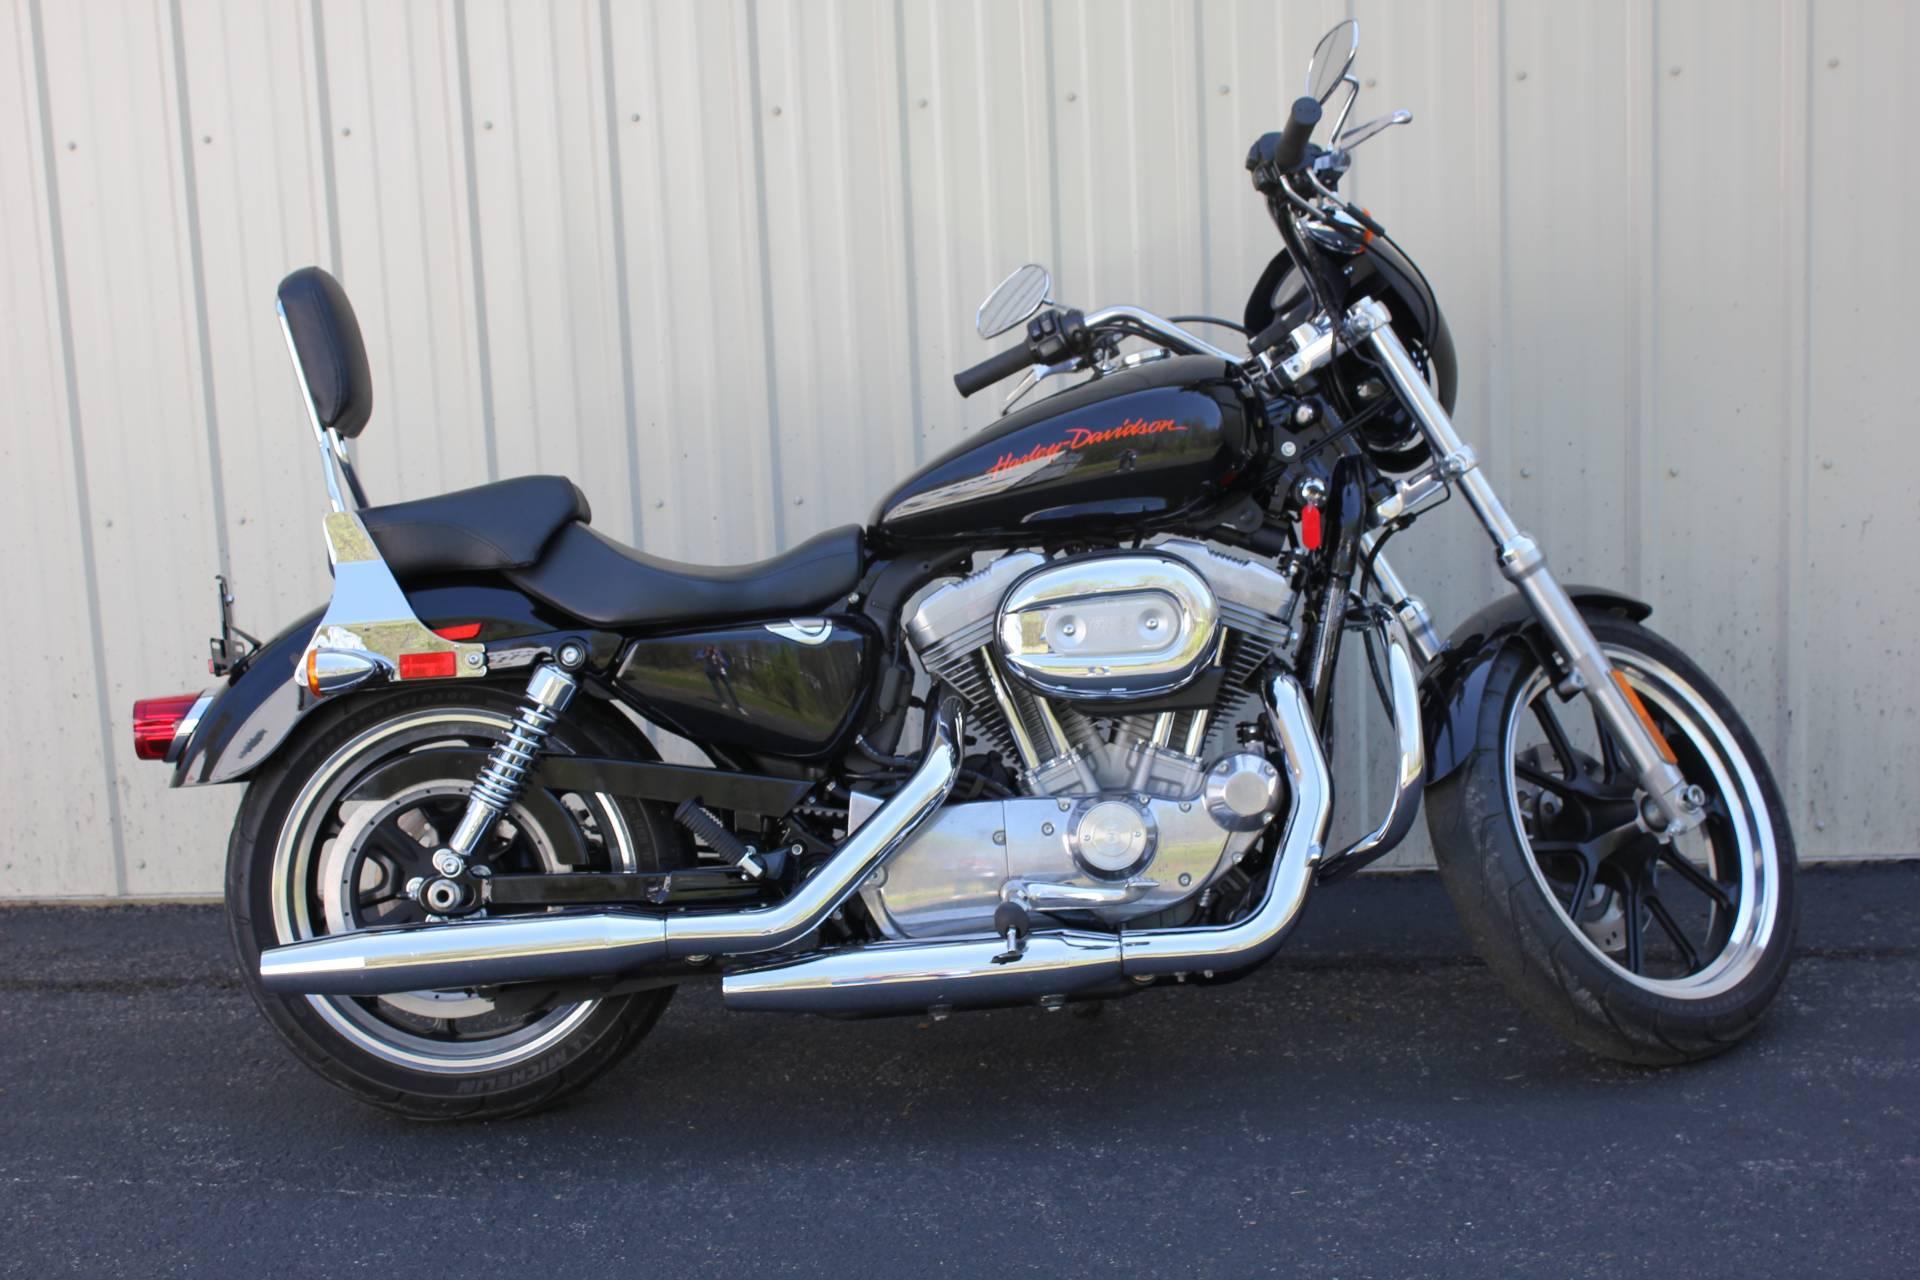 Used 2012 Harley-Davidson Sportster® 883 SuperLow® Motorcycles in ...